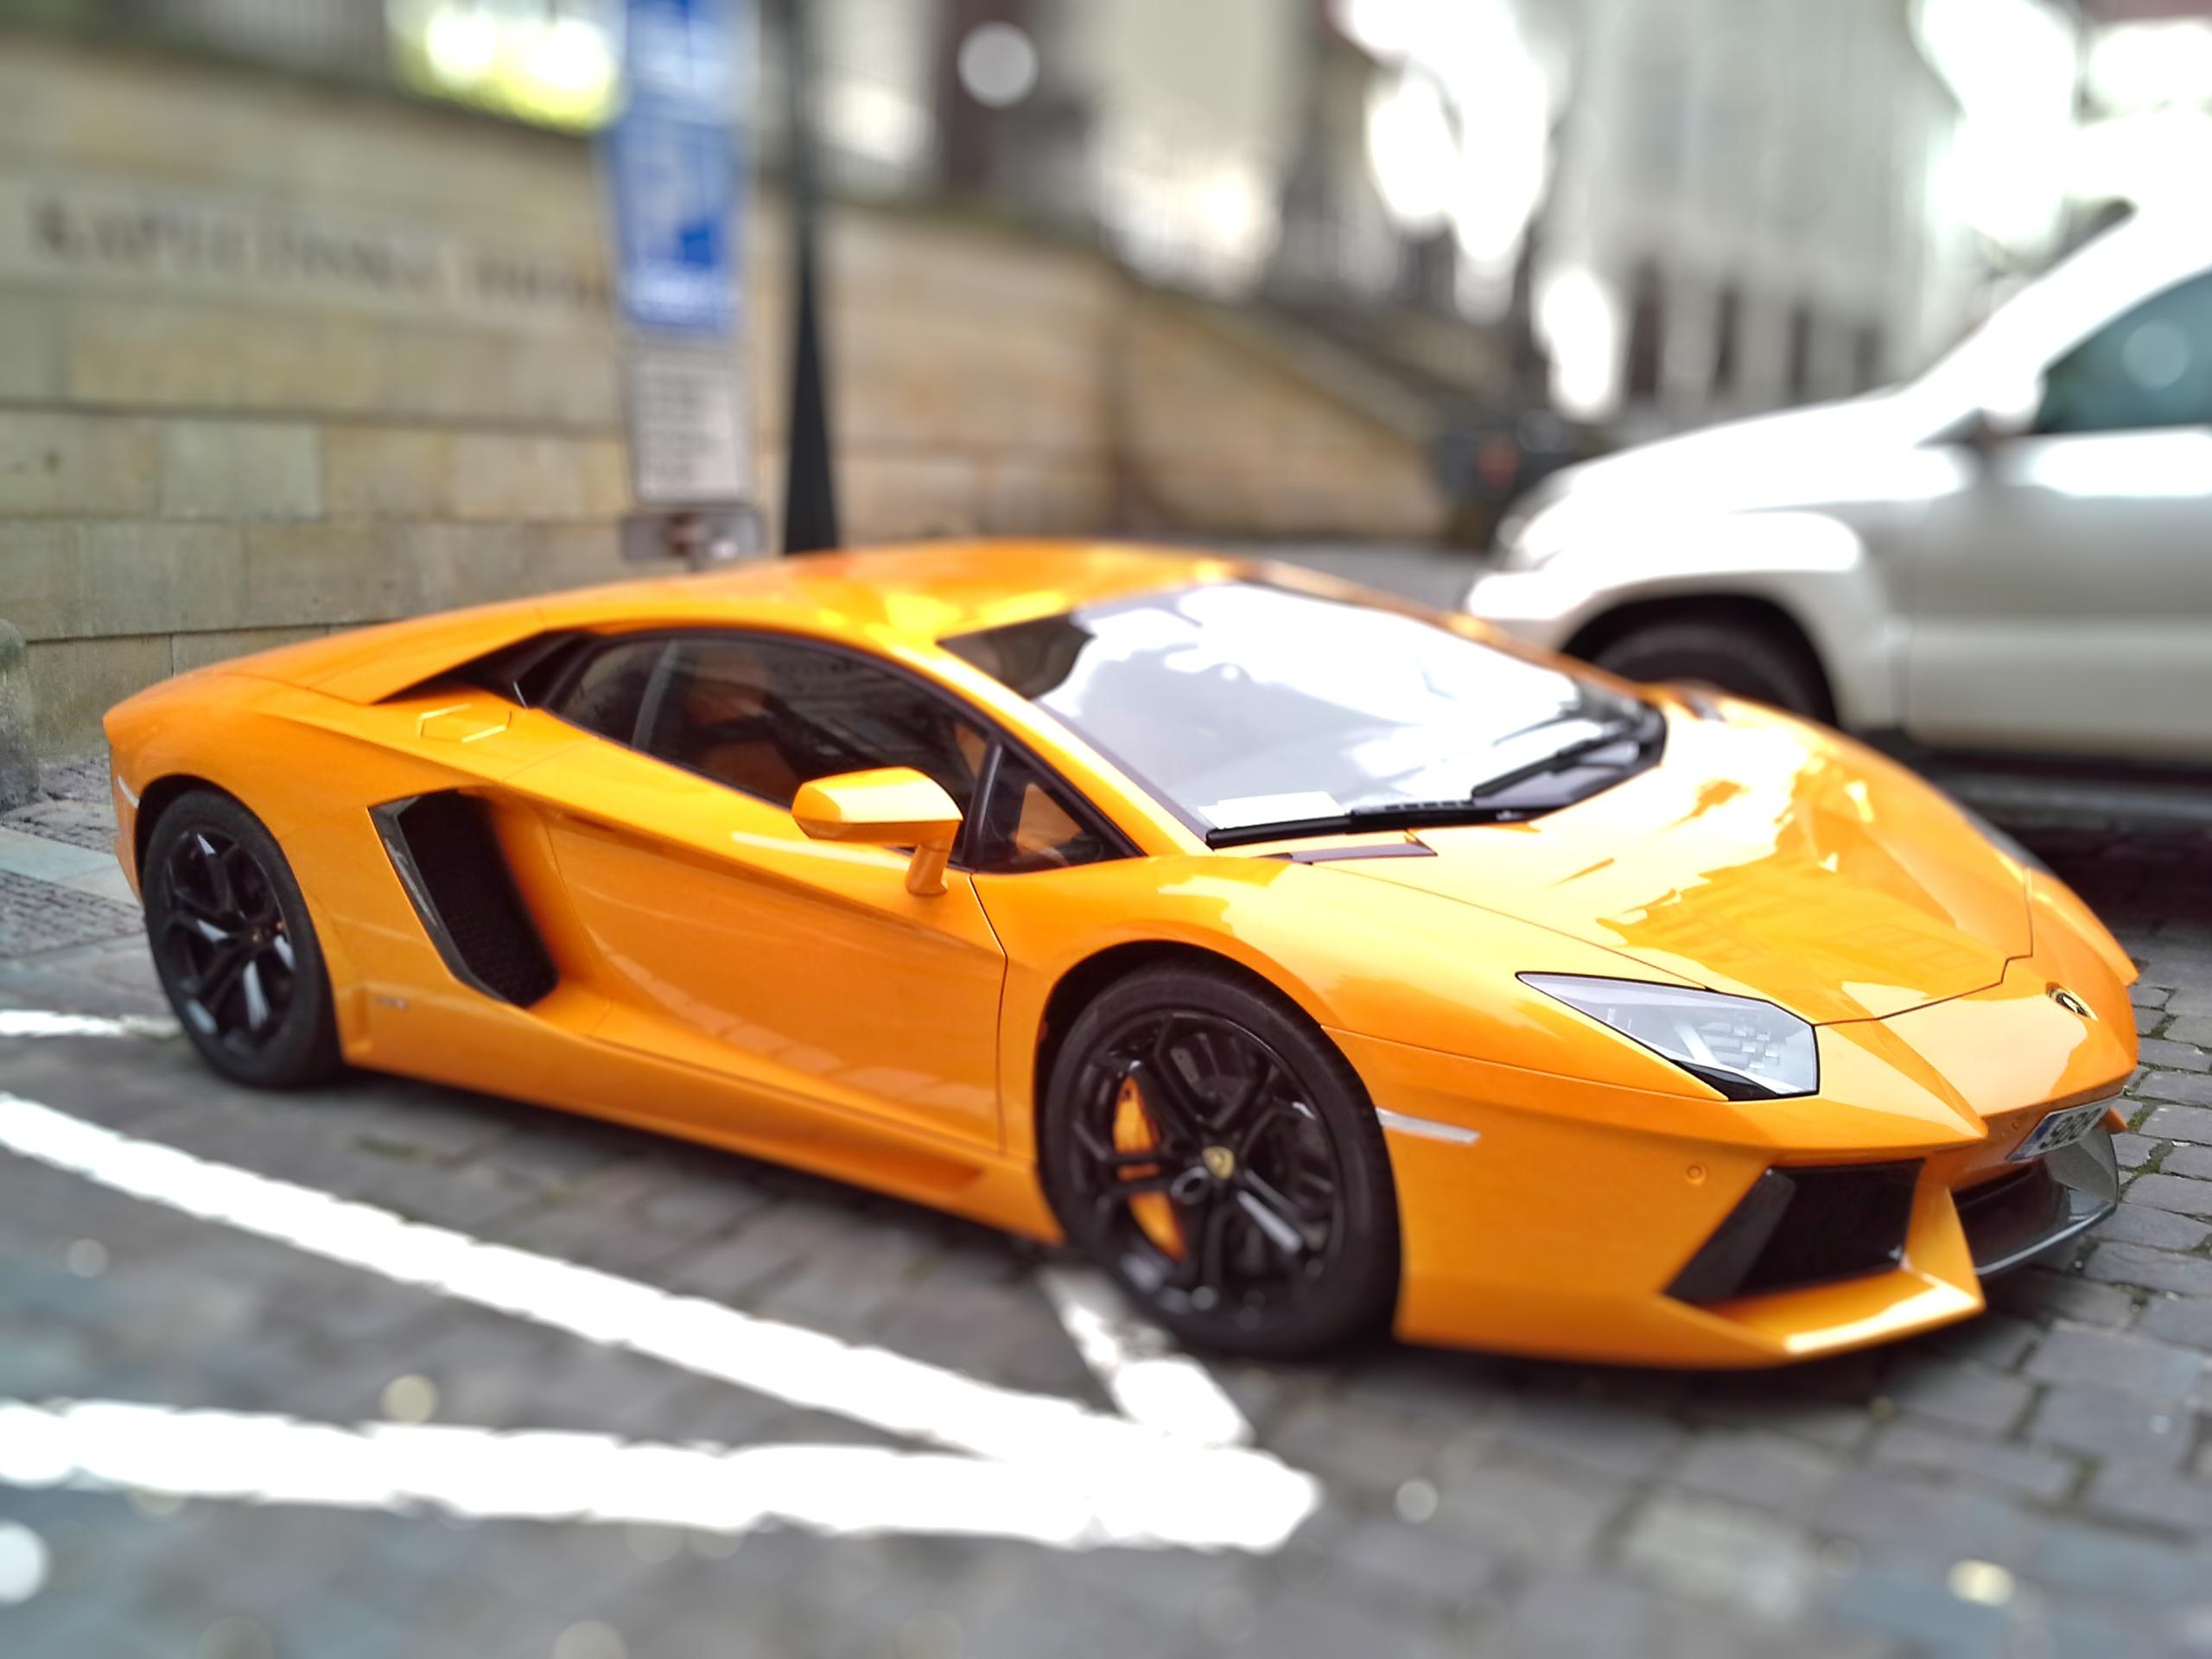 Fotos gratis : Bokeh, rueda, naranja, vehículo, coche deportivo ...